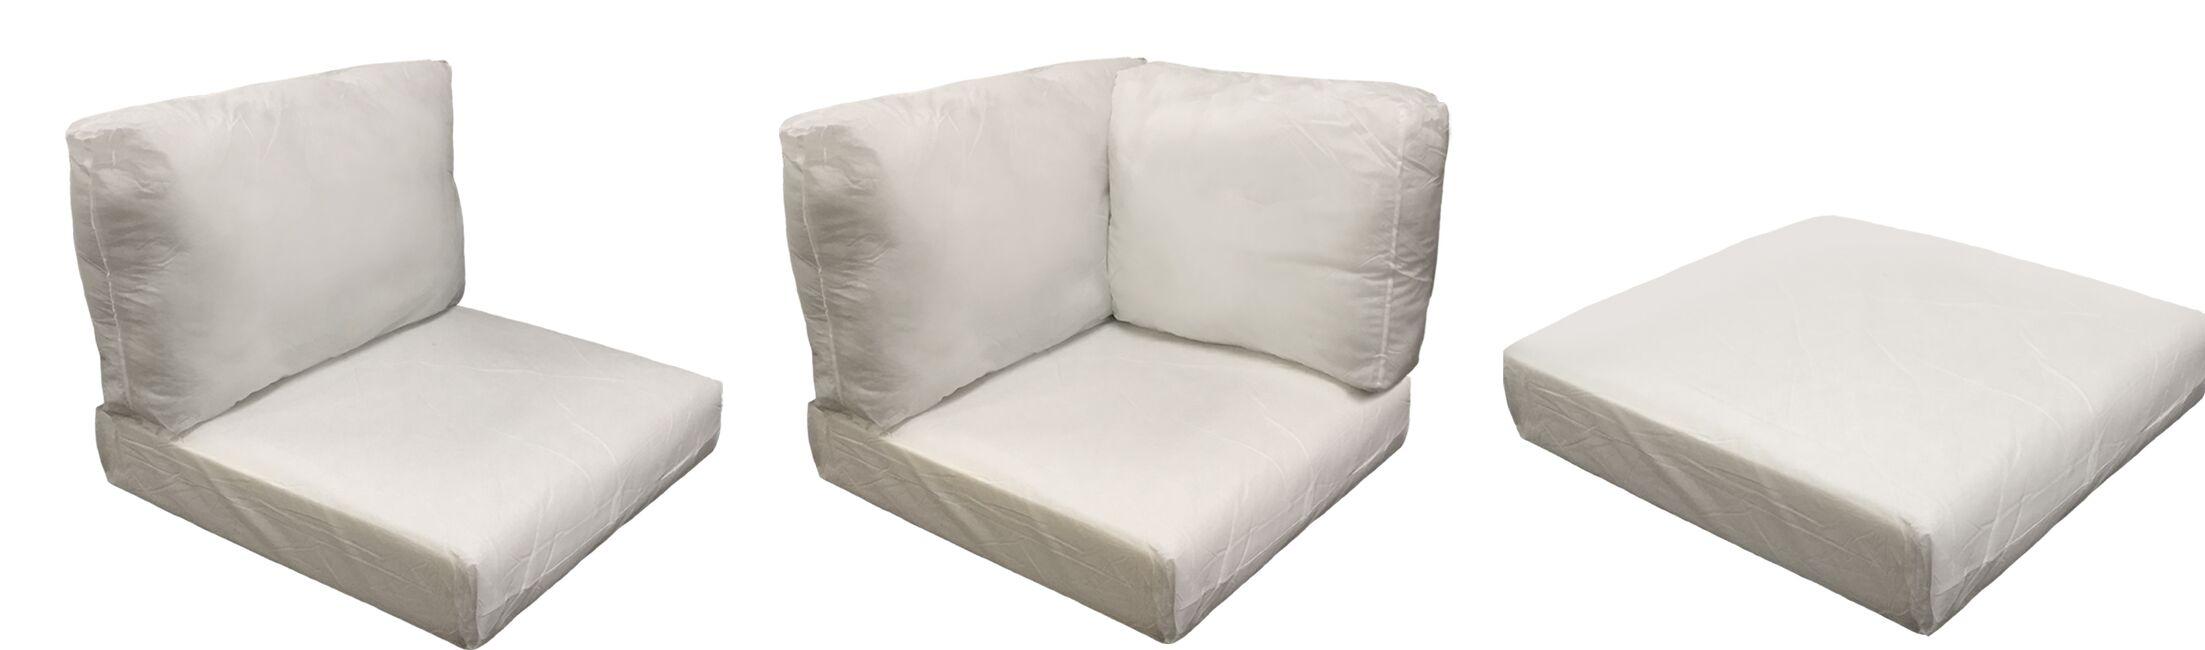 Fairmont Outdoor 21 Piece Lounge Chair Cushion Set